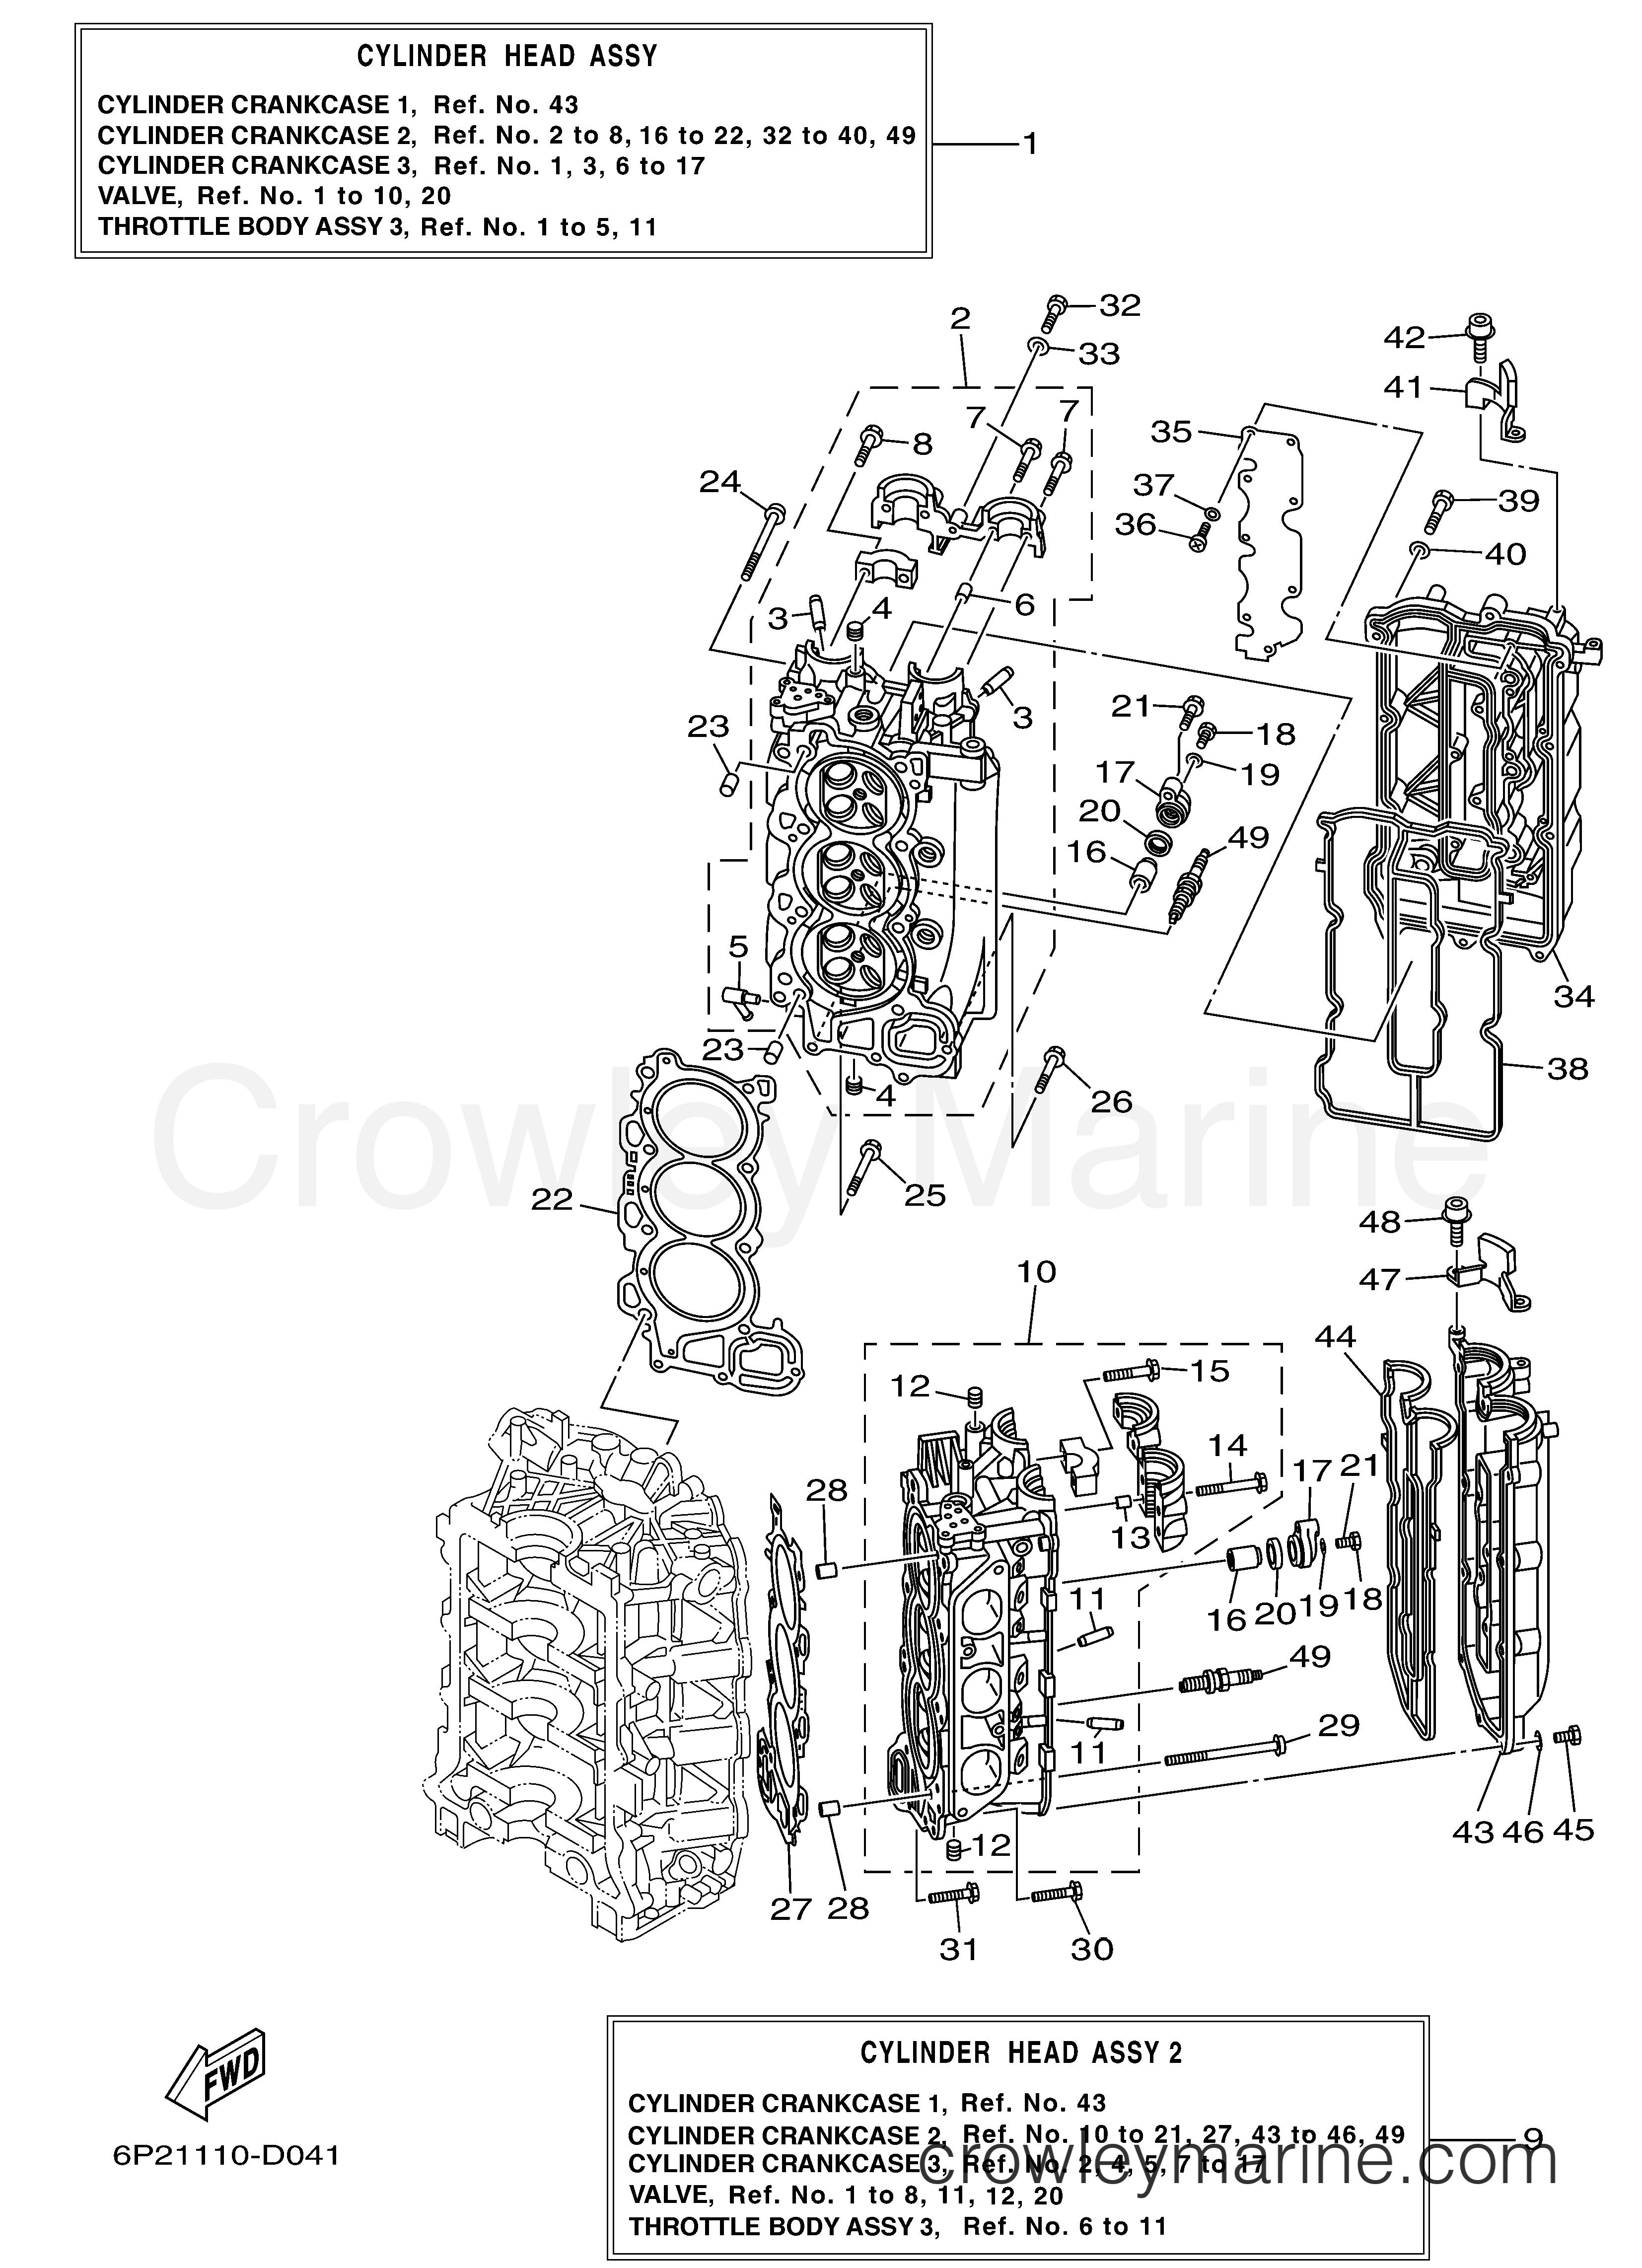 cylinder crankcase 2